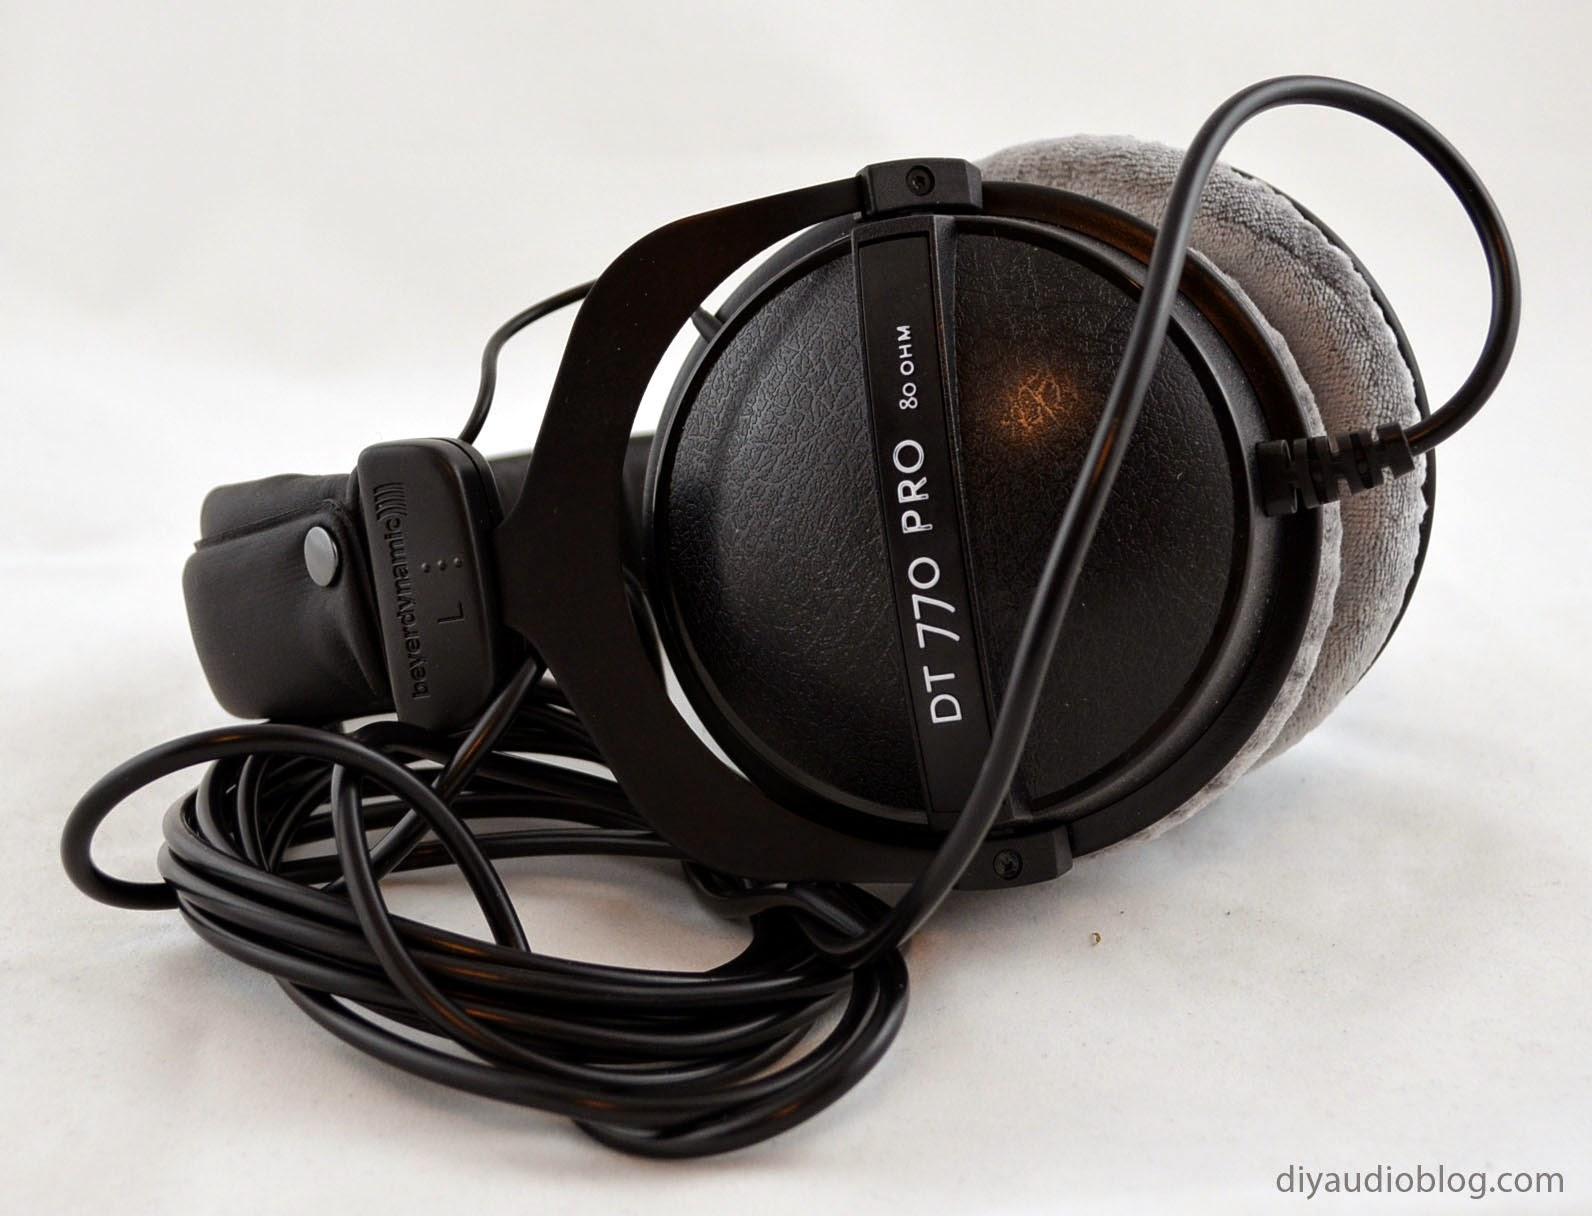 Beyerdynamic%2BDT770 diy audio electronics from zynsonix com beyerdynamic dt 770 wiring diagram at alyssarenee.co